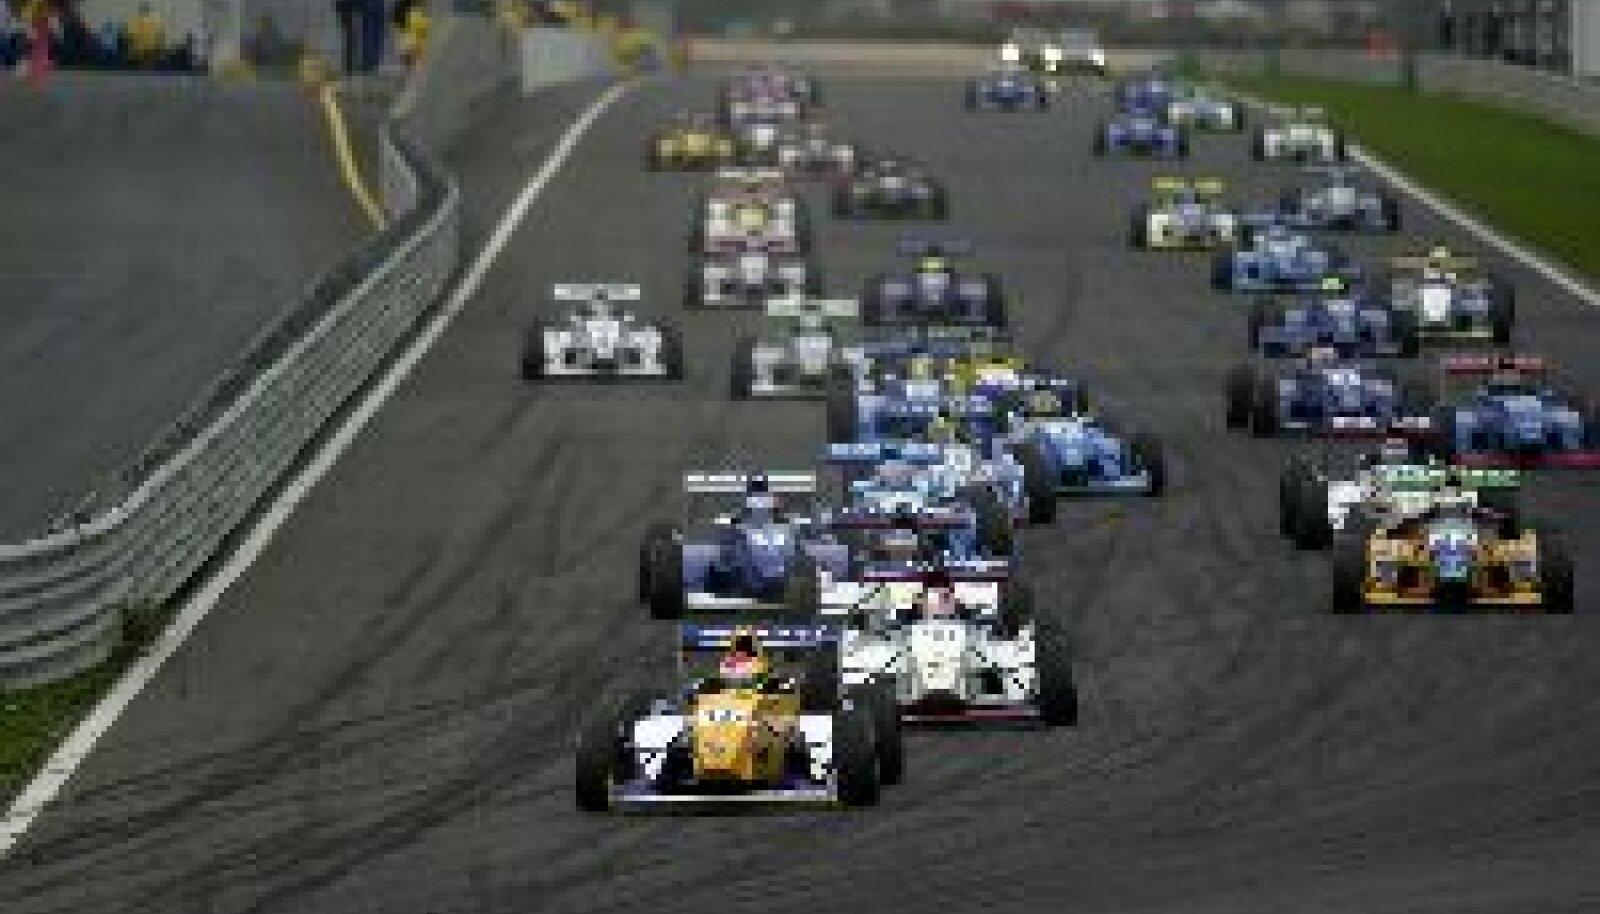 VORMEL RENAULT 2000: Sai Kimi Räikkönenile hüppelauaks tippklassi. Renault